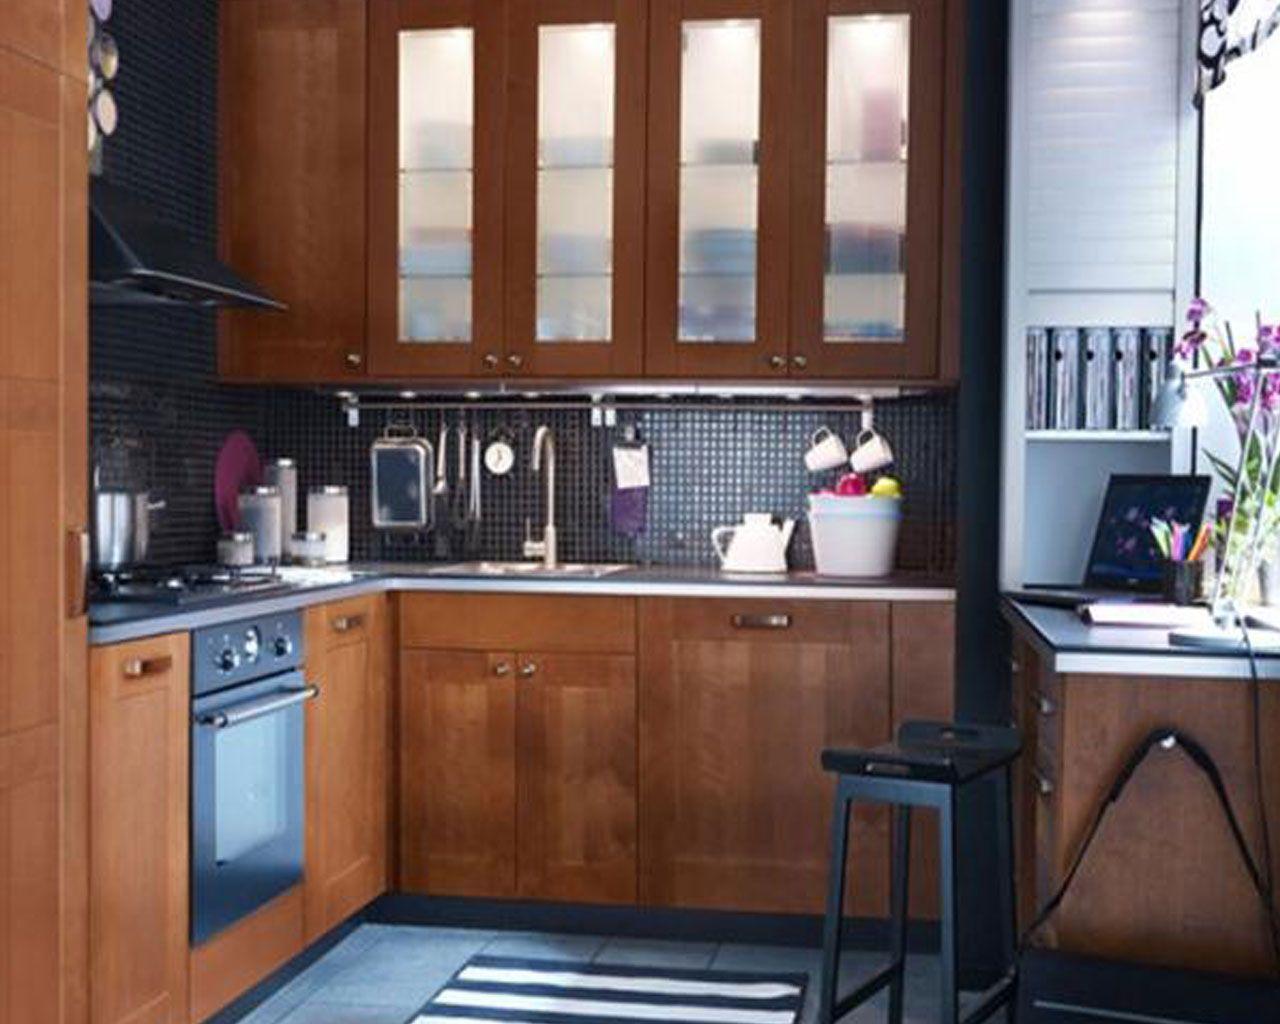 Ikea Kitchen Designer Atlanta Hiplyfe Jpg 1 280 1 024 Pixels Kitchen Remodel Small Ikea Small Kitchen Kitchen Design Software